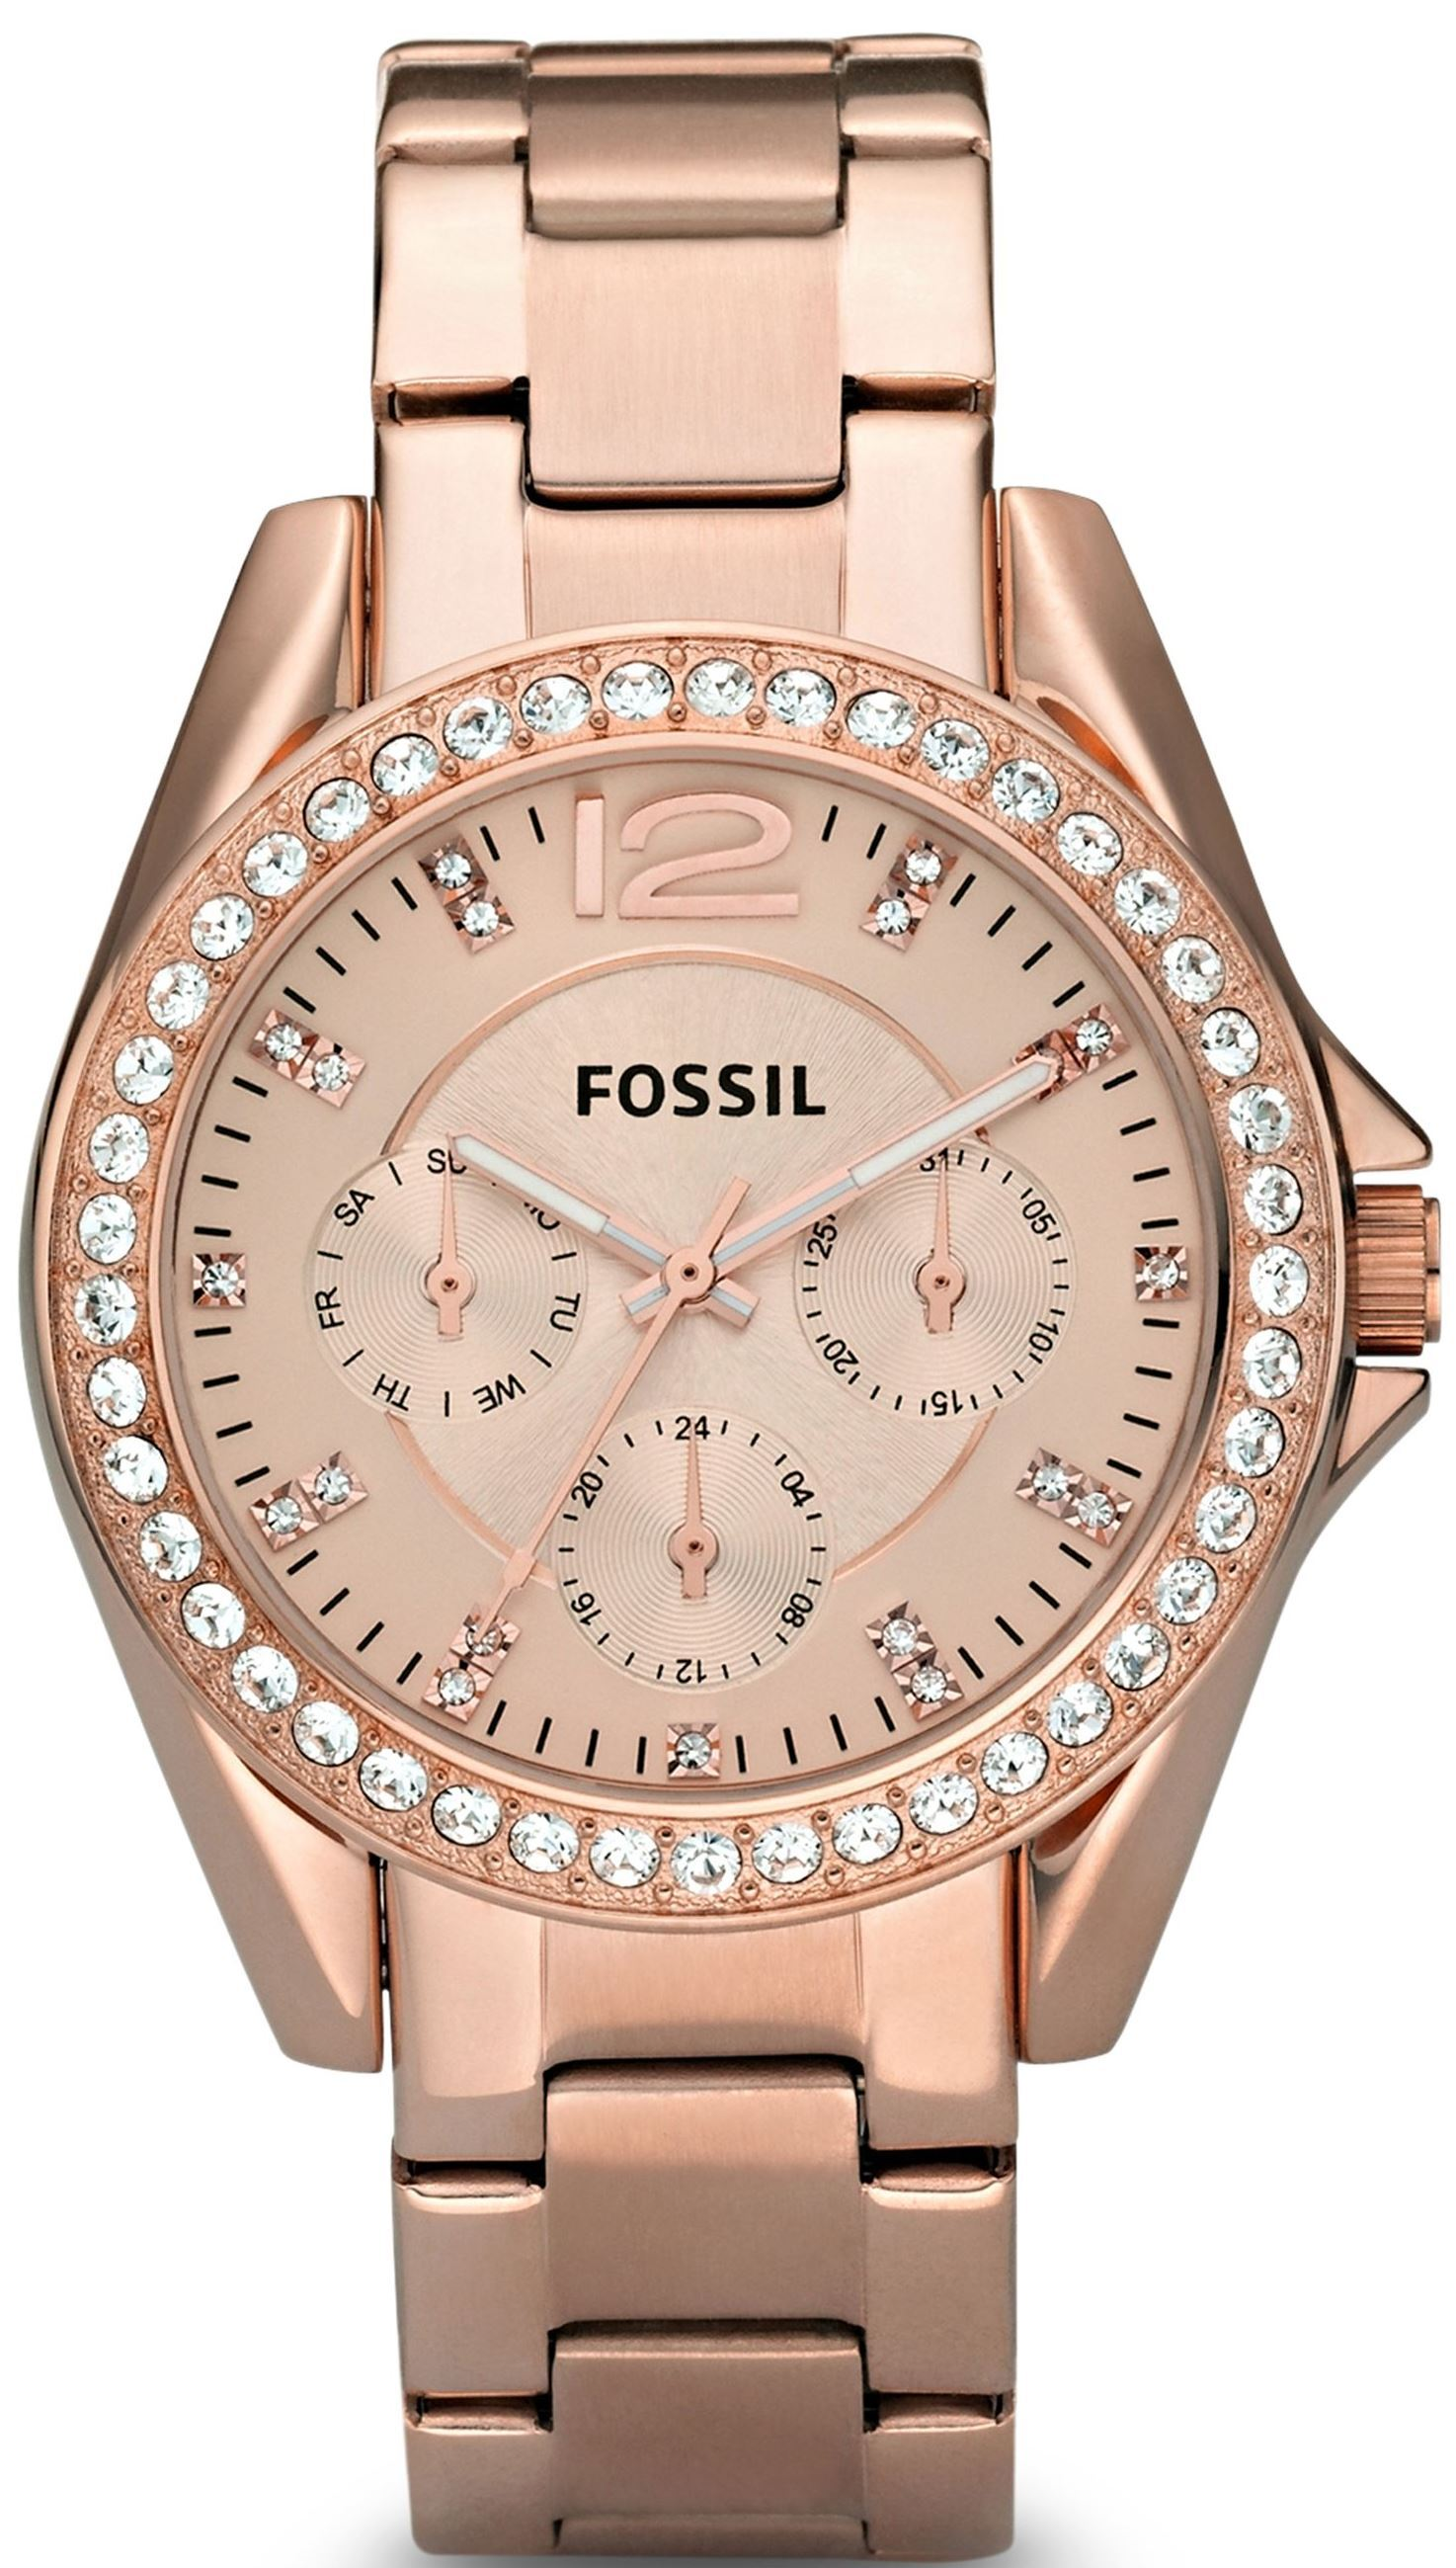 Fossil Riley Dameklokke ES2811 Rosegullfarget/Rose-gulltonet stål - Fossil